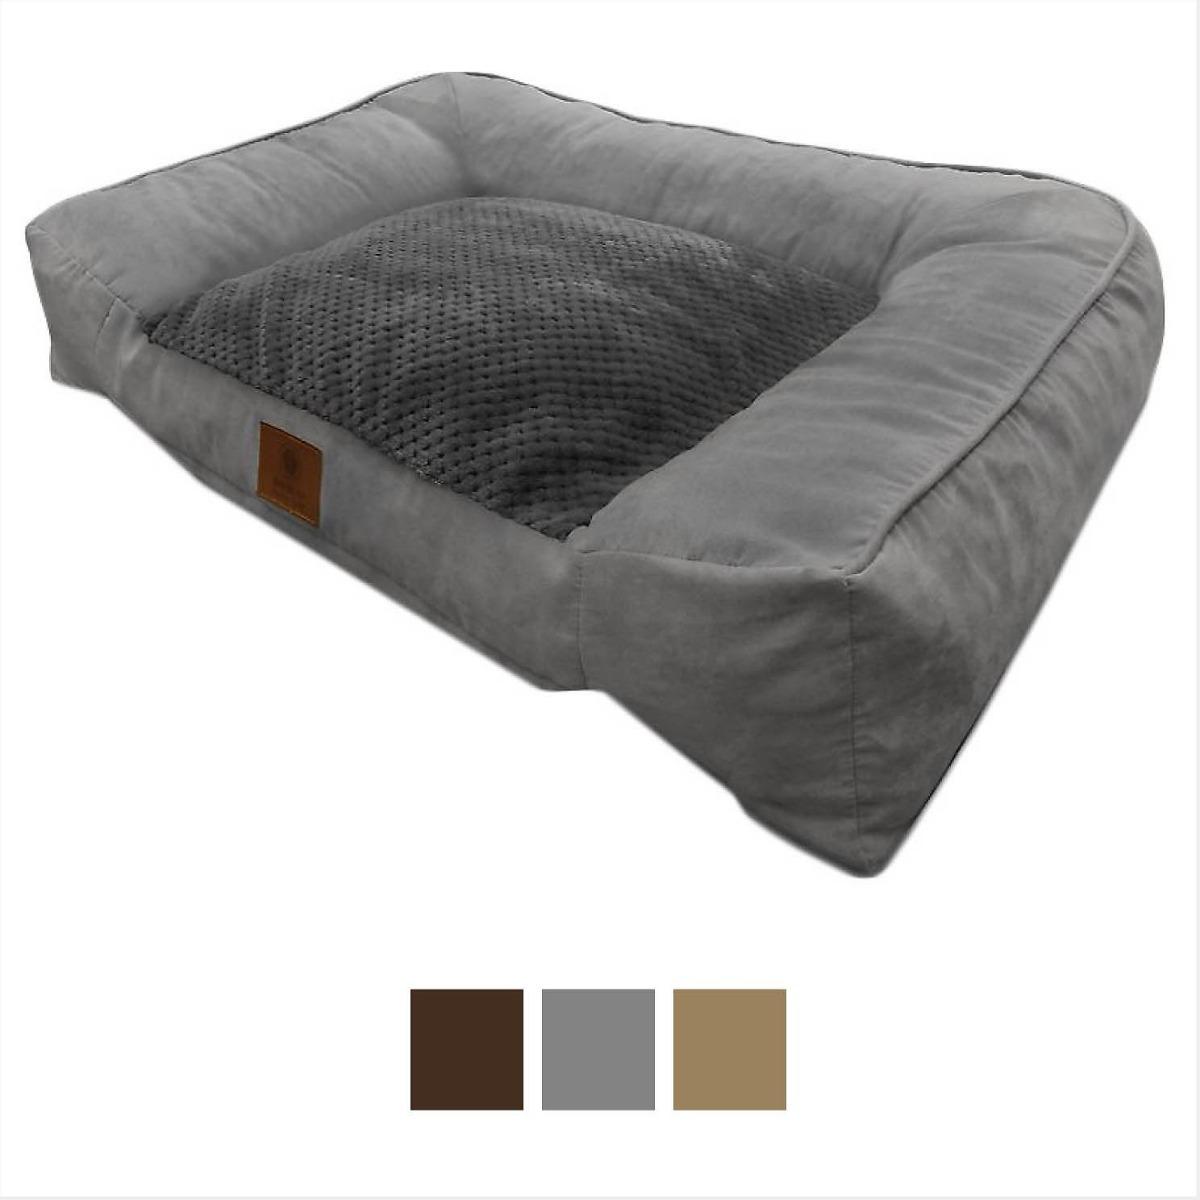 cama sofa para perros mercadolibre steamer extra grande 1 389 00 en mercado libre cargando zoom